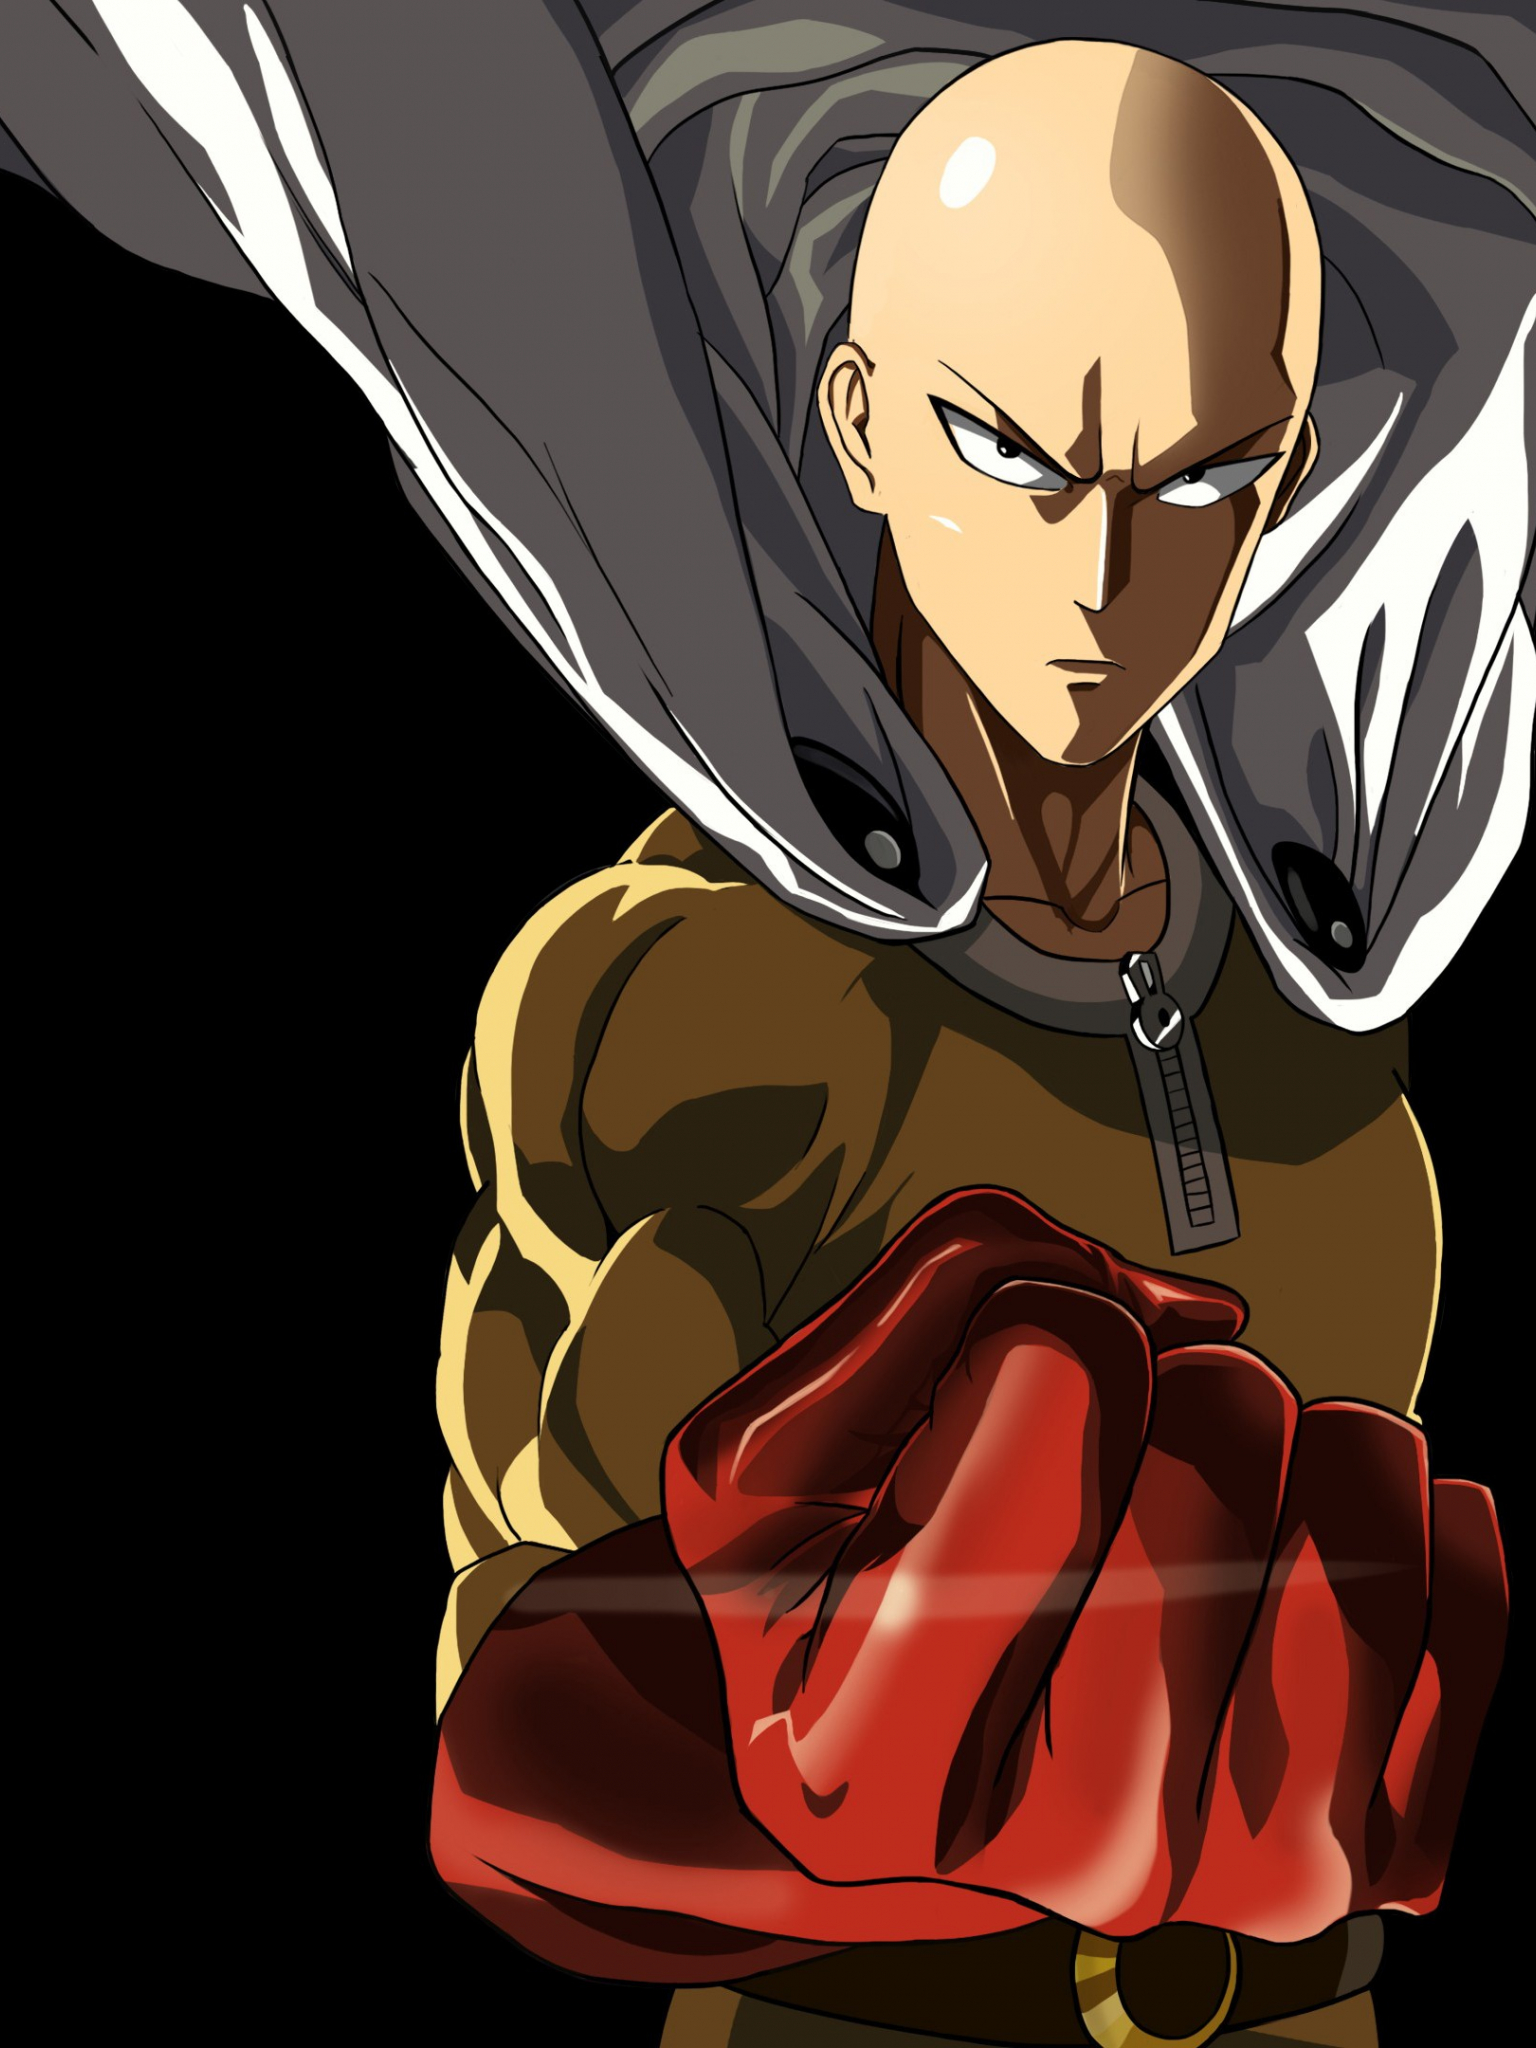 Free Download Saitama One Punch Man Anime Hd Wallpaper Ihd